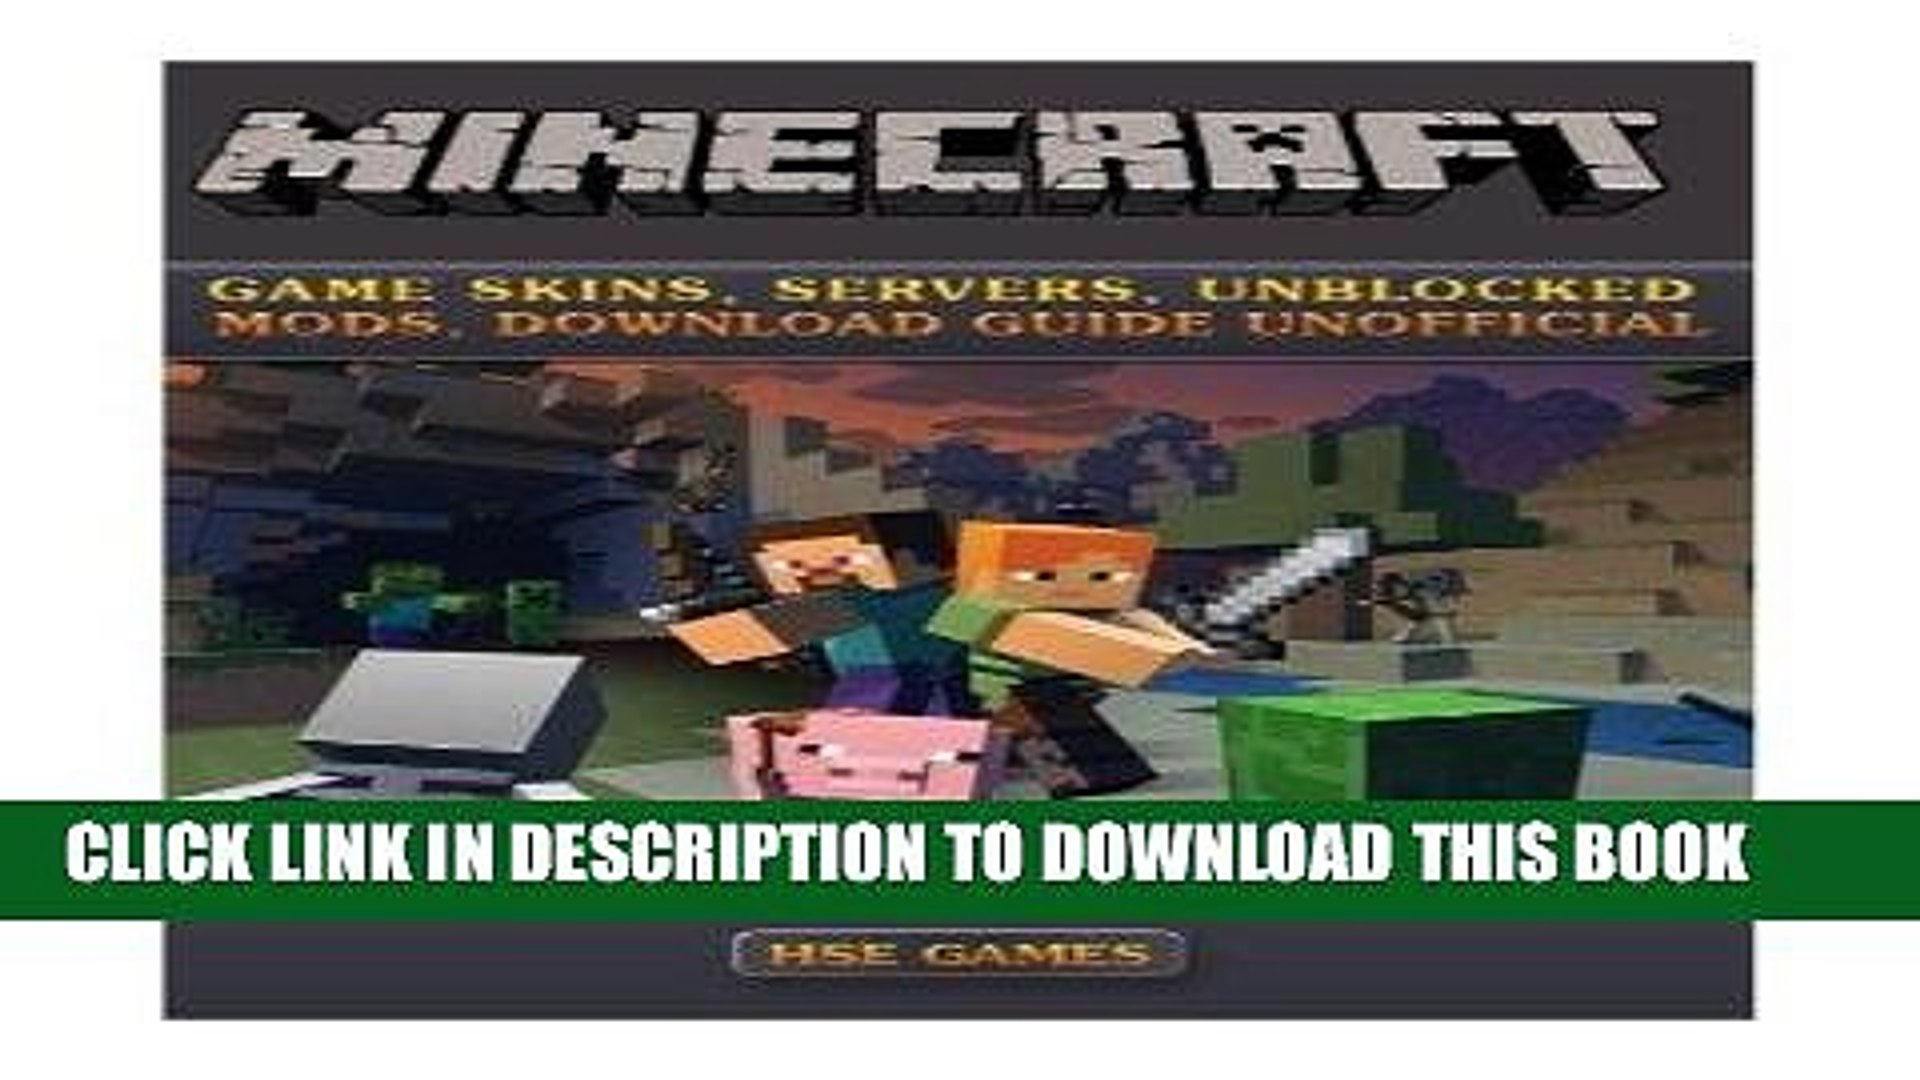 PDF] Minecraft Game Skins, Servers, Unblocked Mods, Download Guide